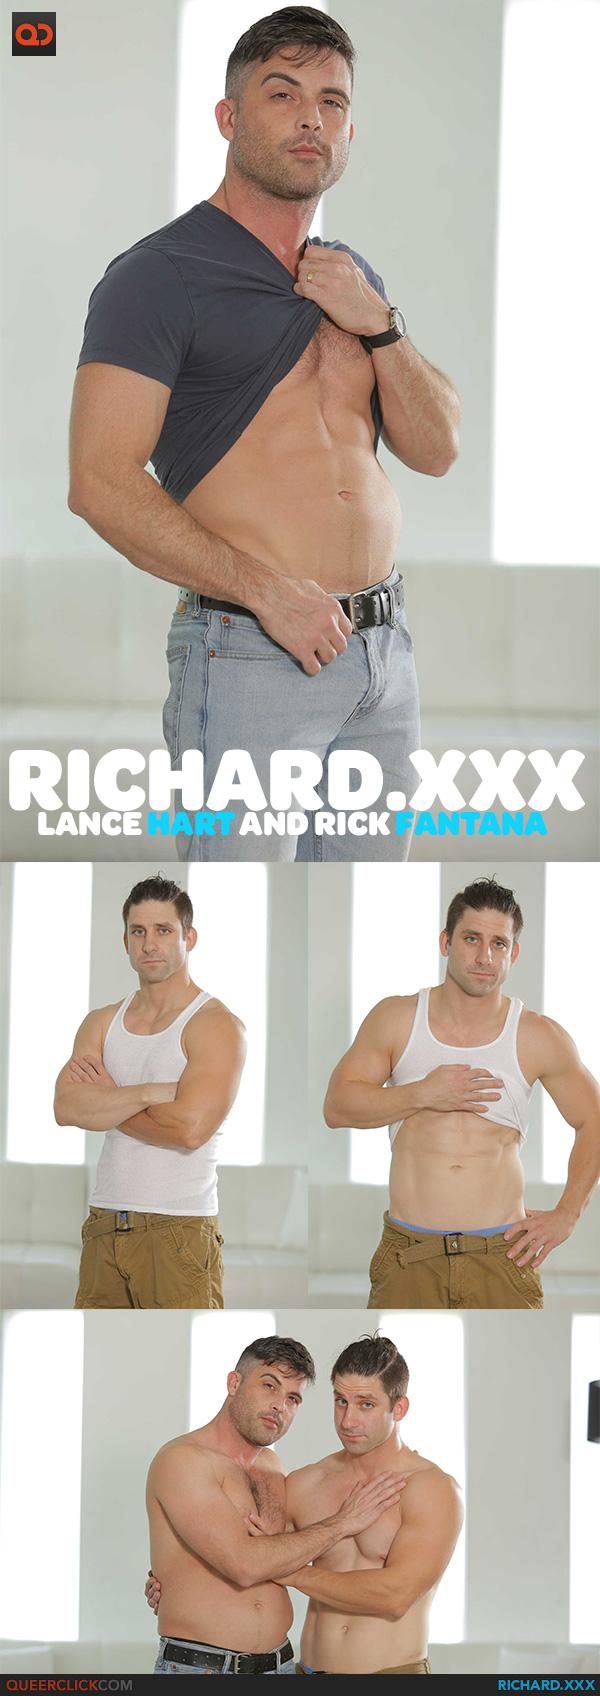 Richard.XXX:  Lance Hart and Rick Fantana